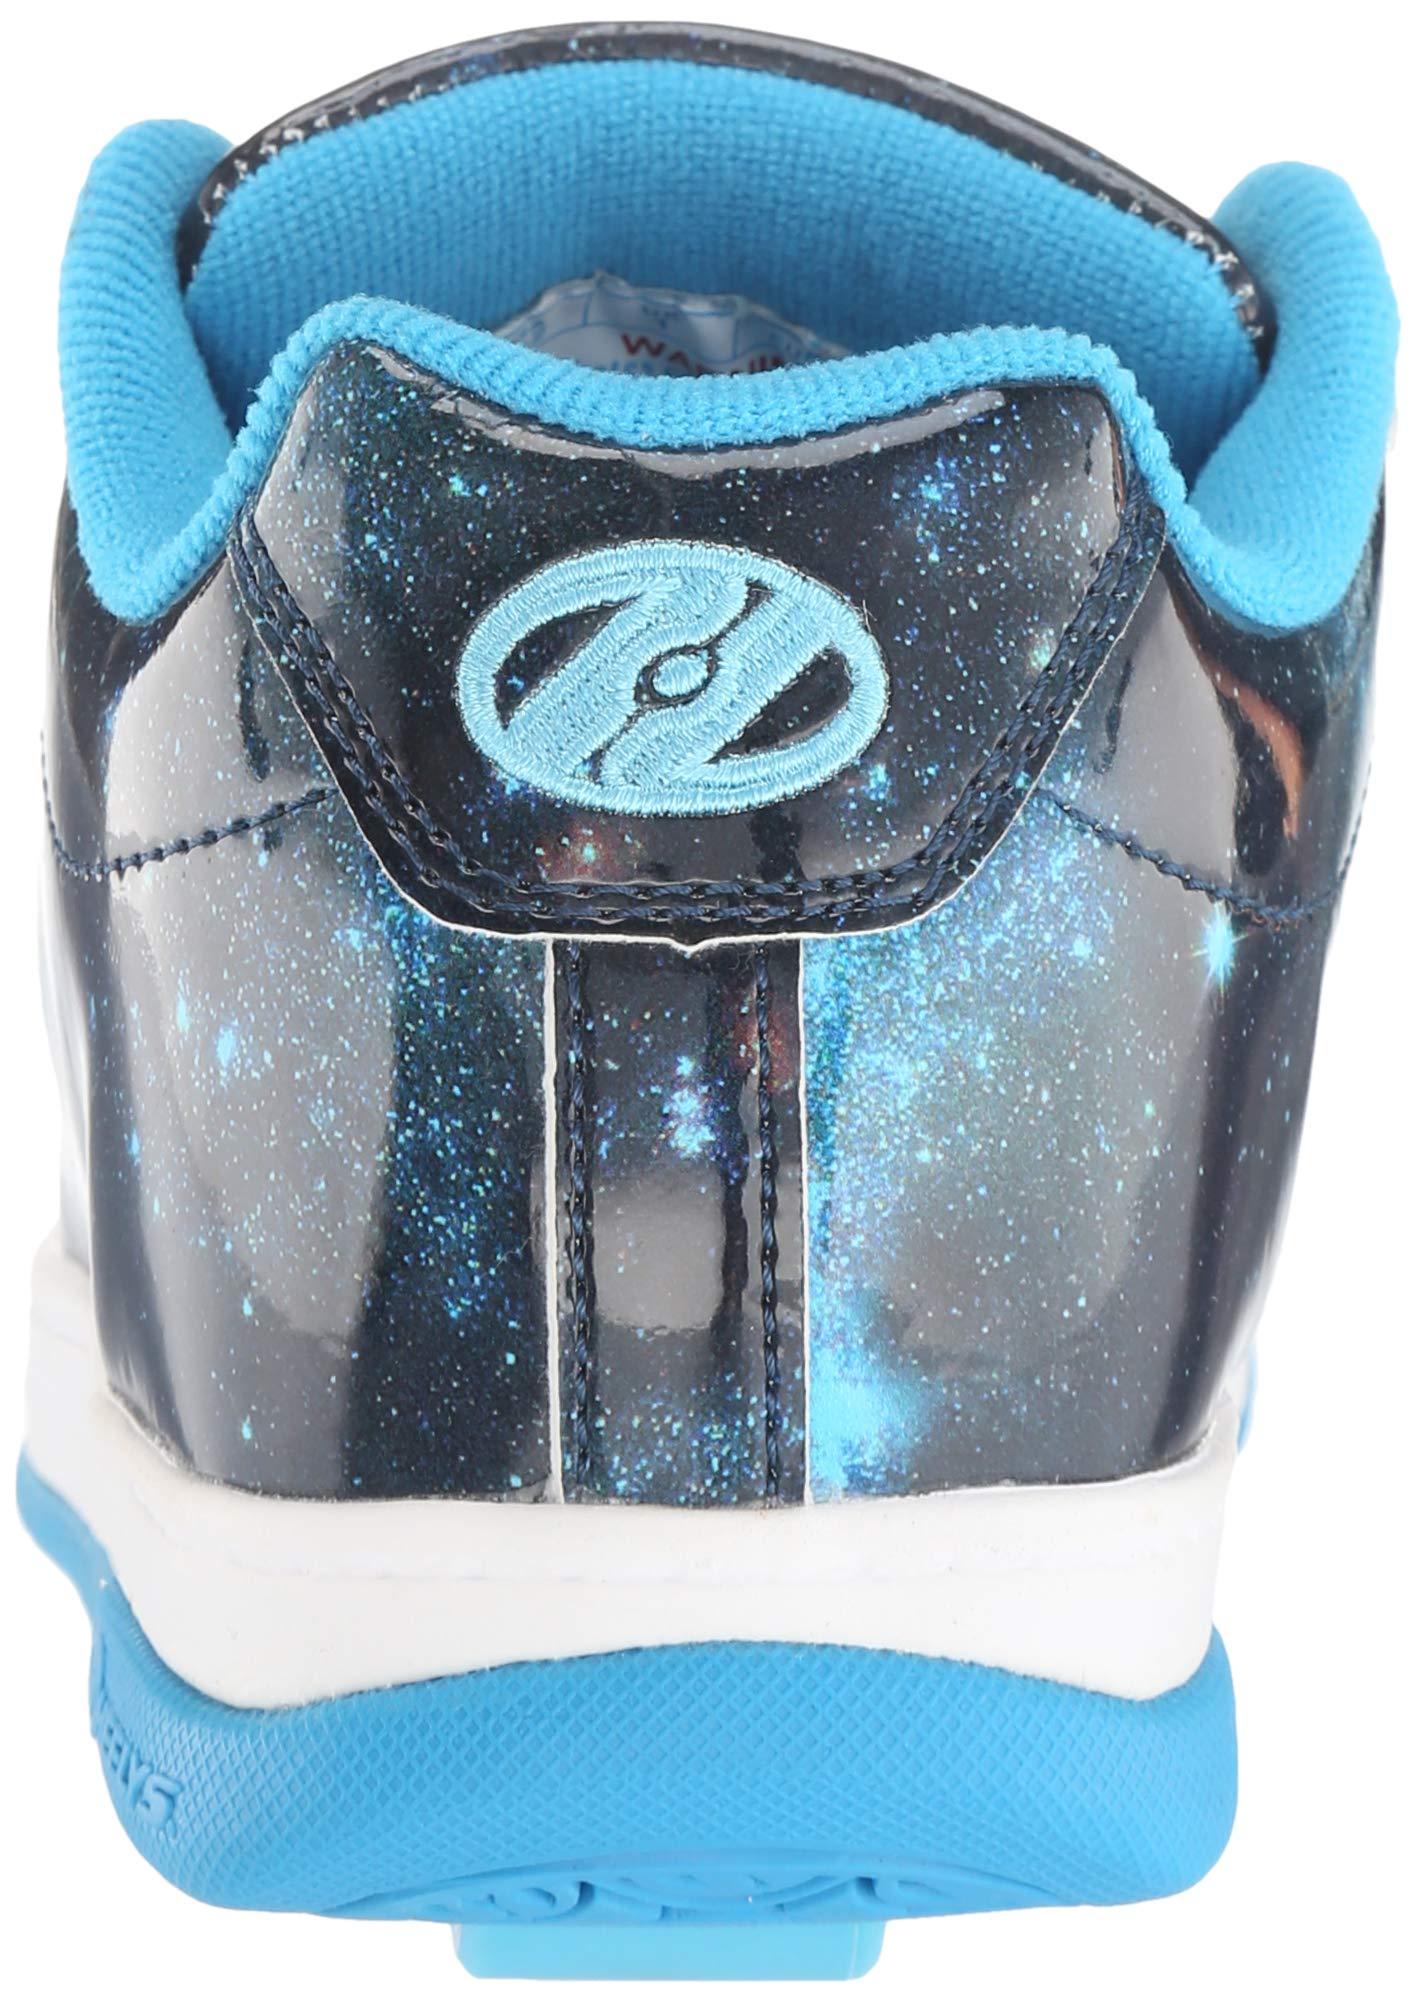 Heelys Girls' Split Tennis Shoe Blue/Galaxy 2 M US Big Kid by Heelys (Image #2)